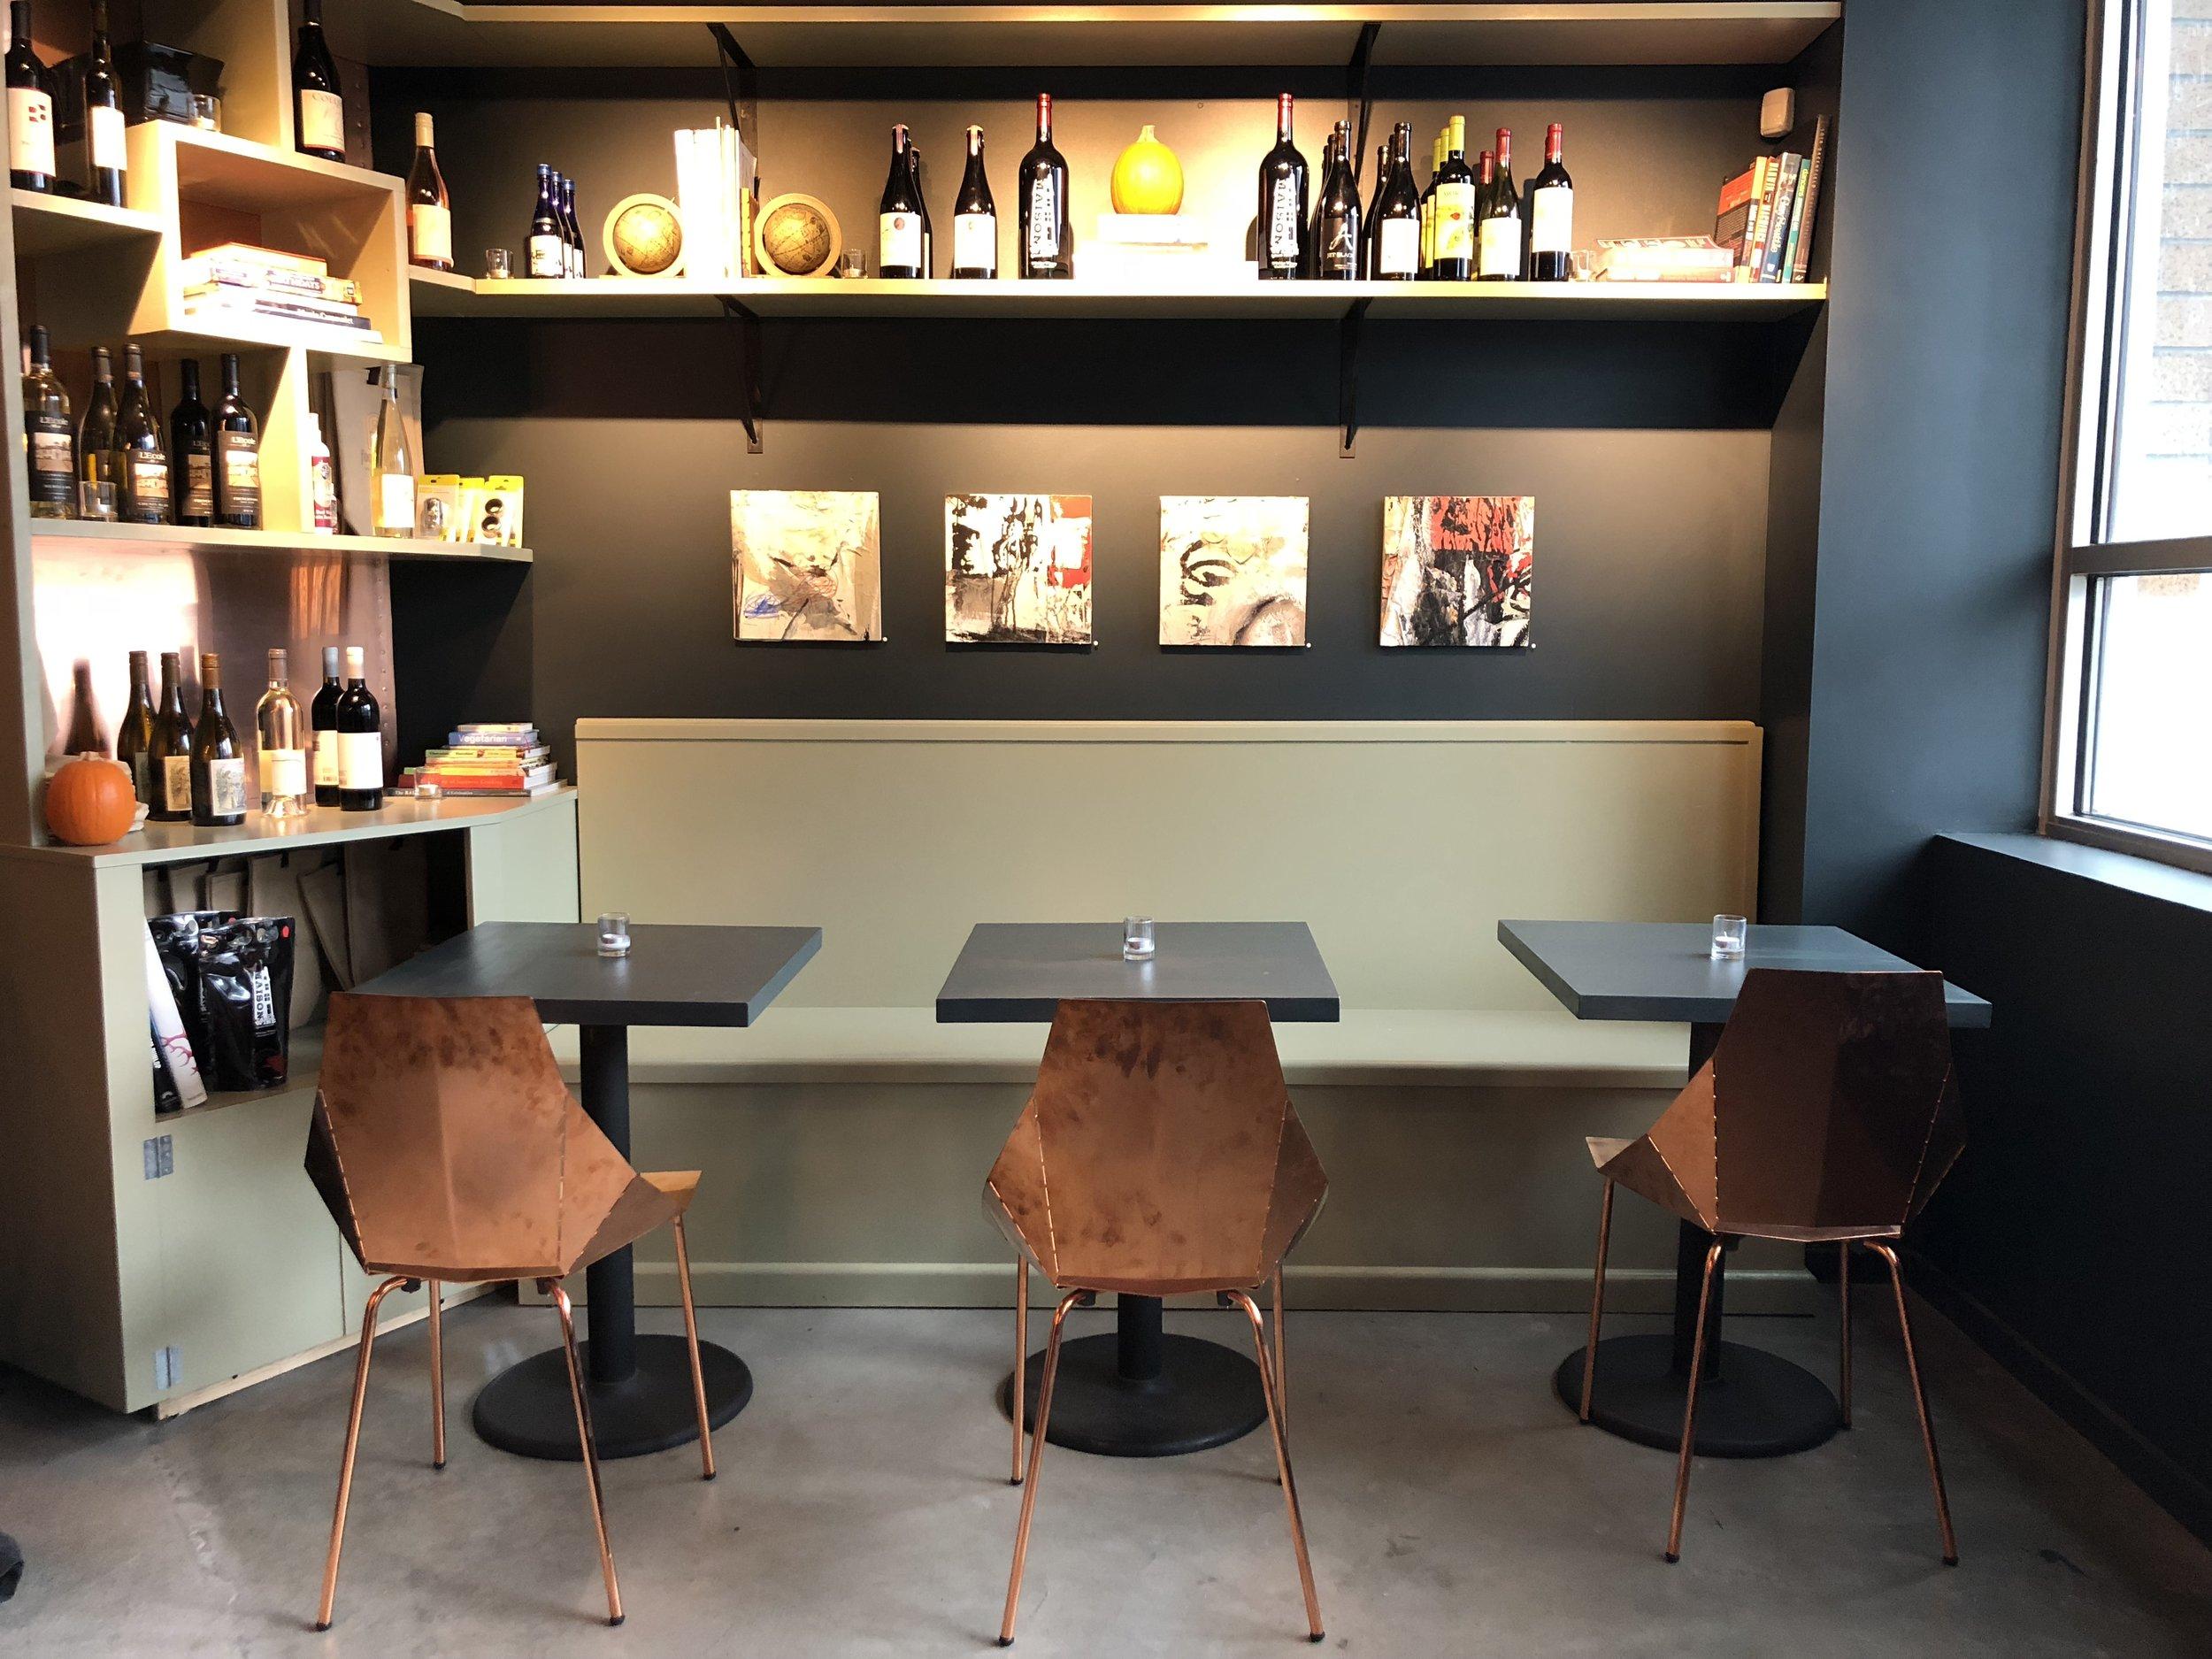 Installation view of Footprint Wine & Tap, Seattle, WA